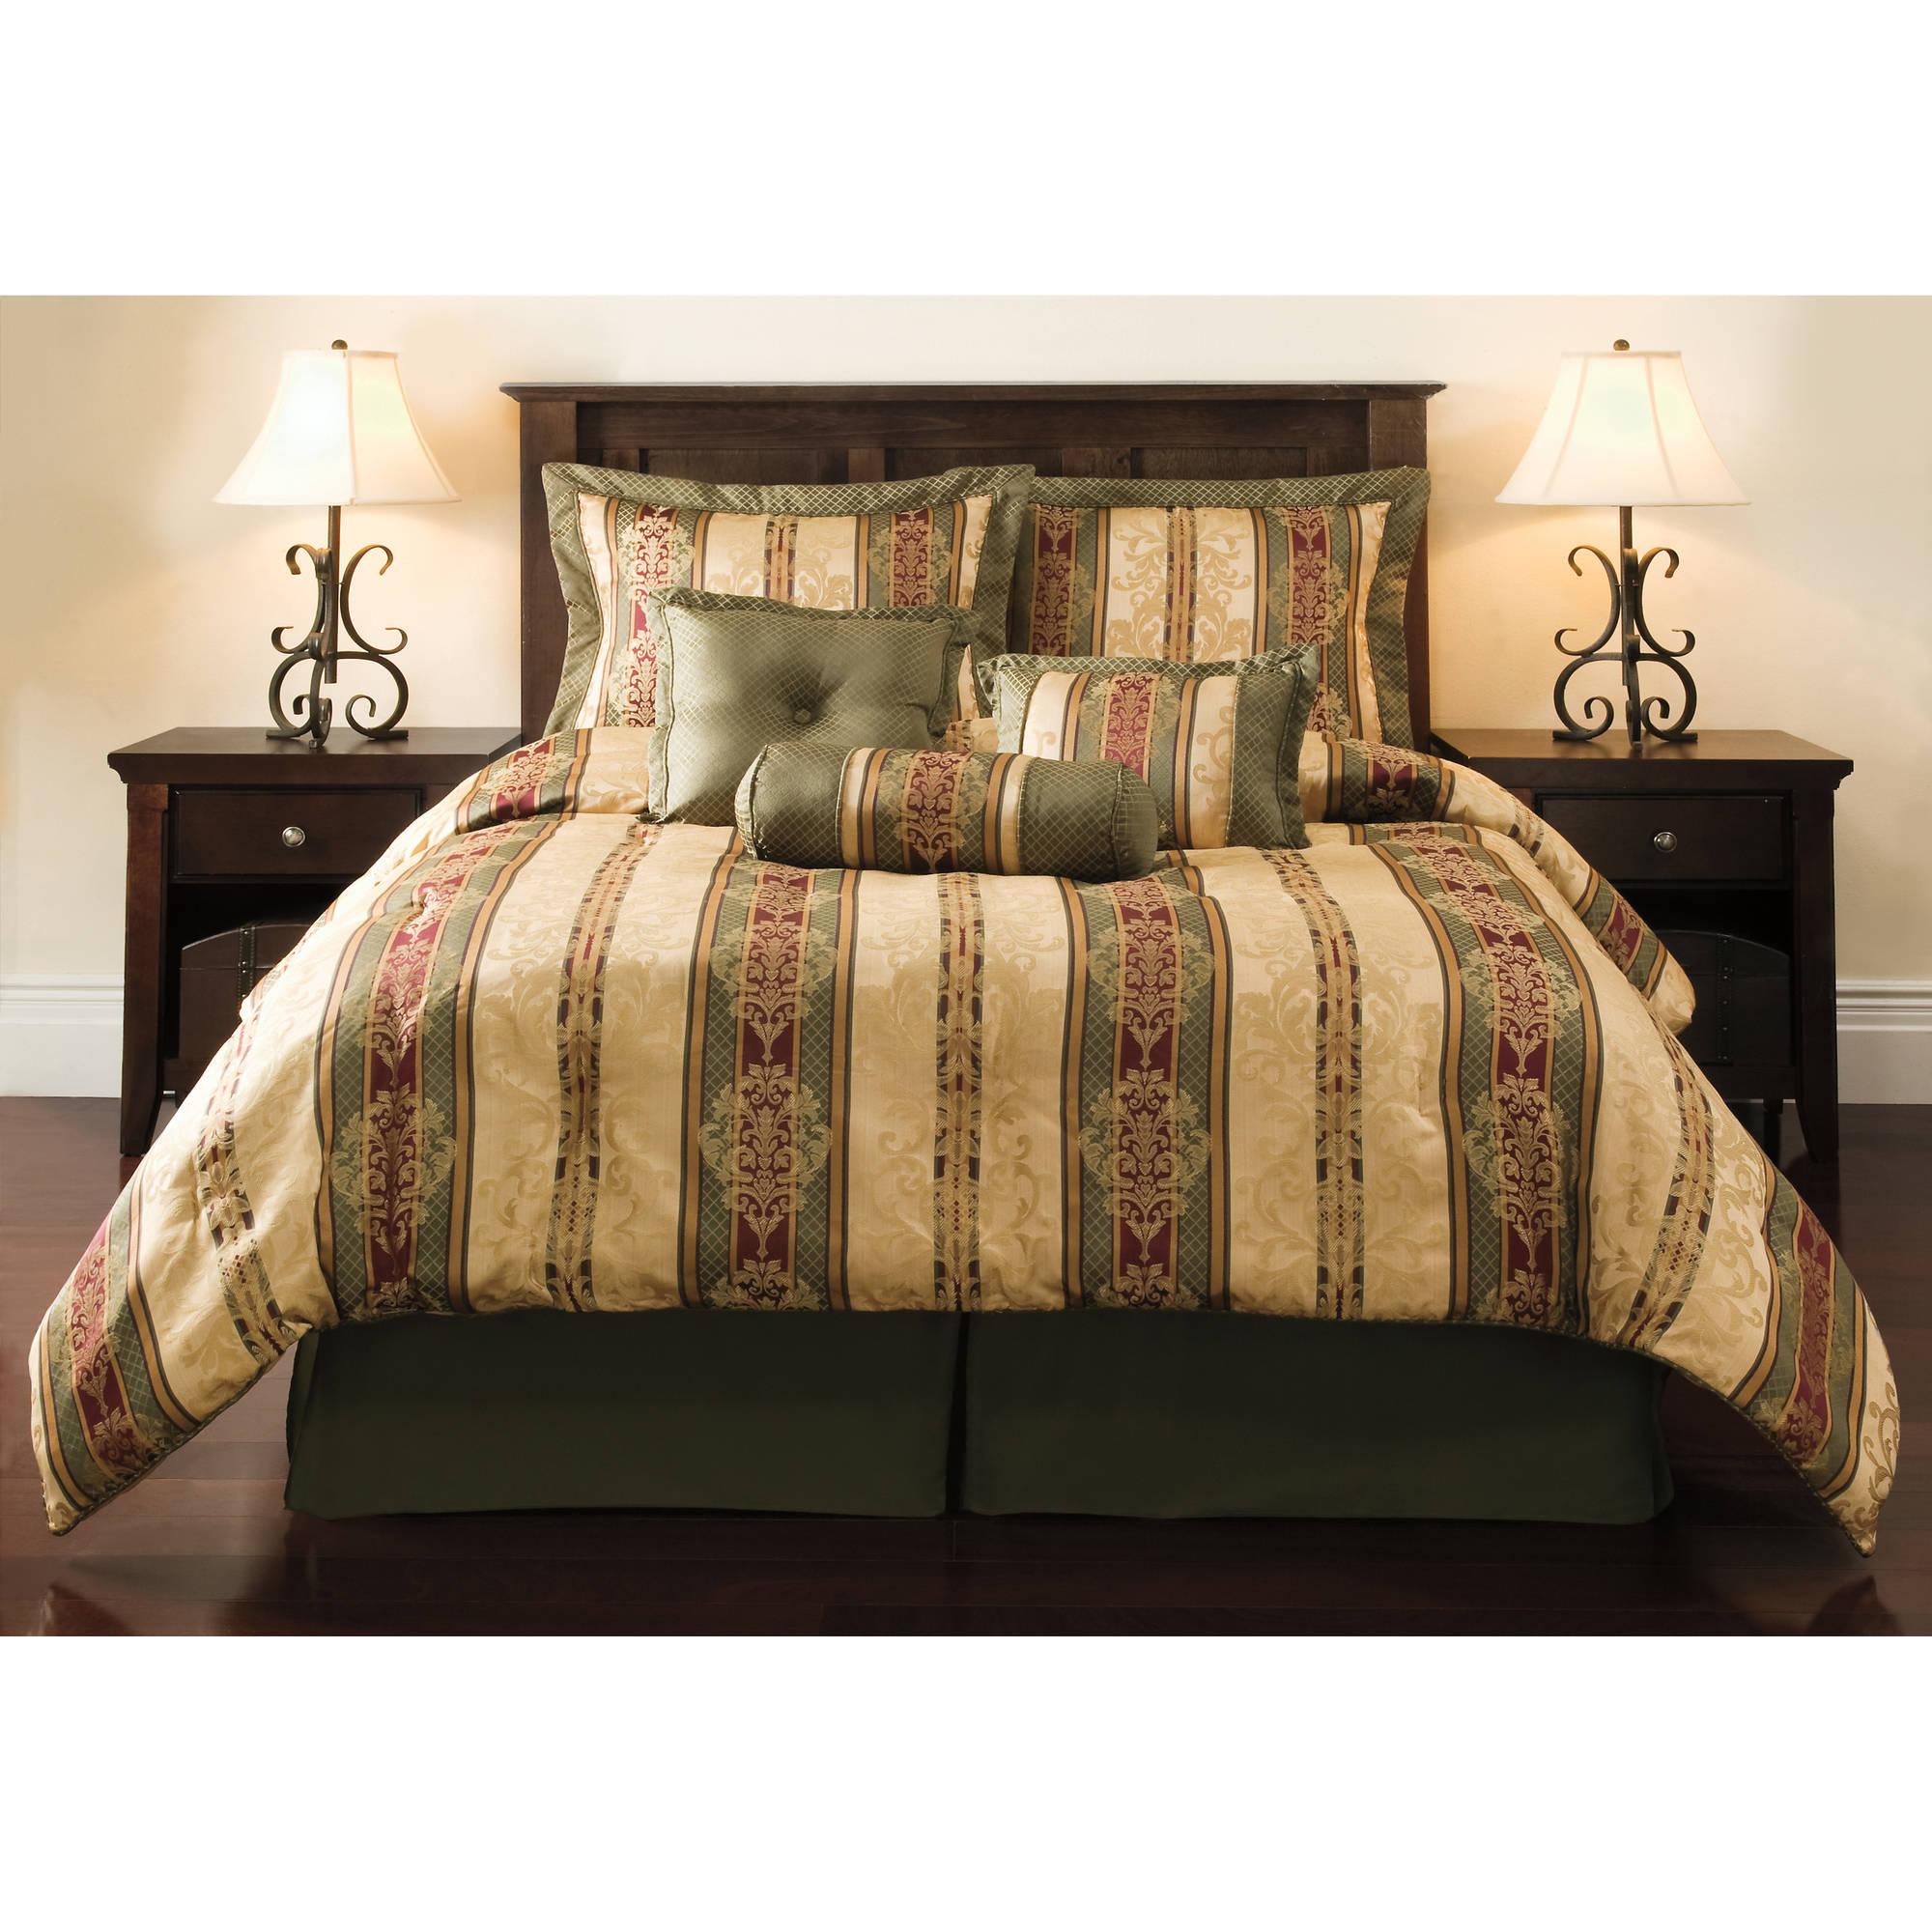 Mainstays 7 Piece Comforter Set, Dakota